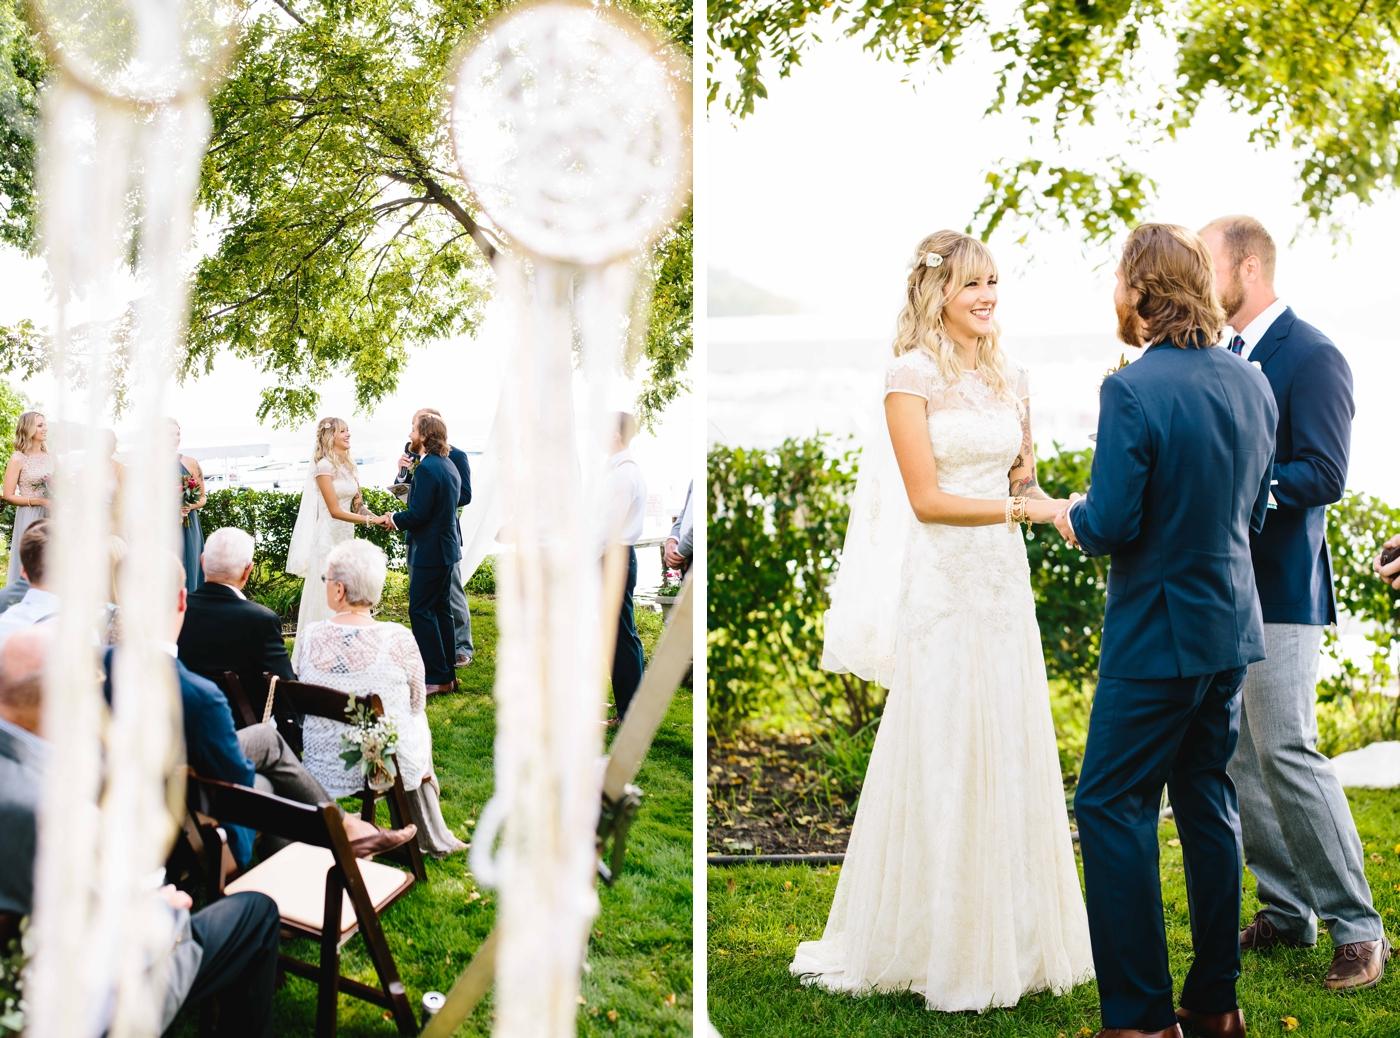 chicago-fine-art-wedding-photography-chriskelsey15